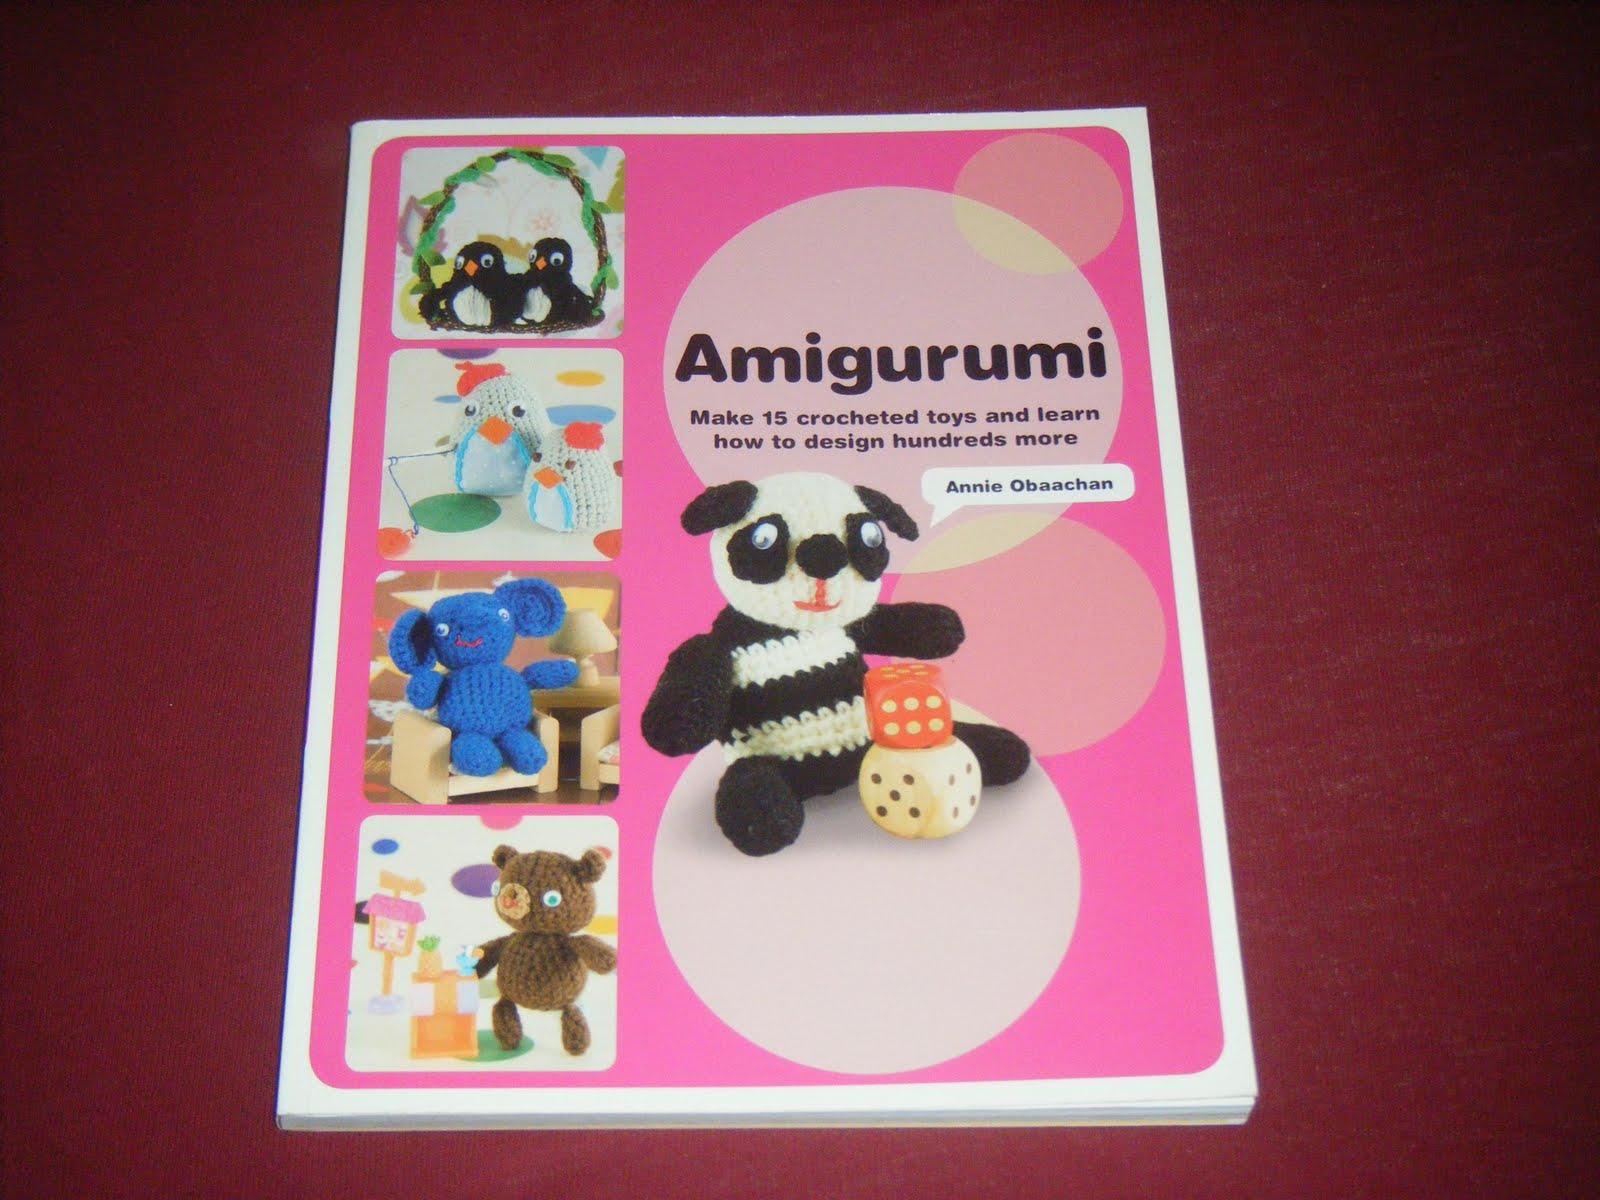 Amigurumi Animals Annie Obaachan : The glorious books!: Amigurumi animals